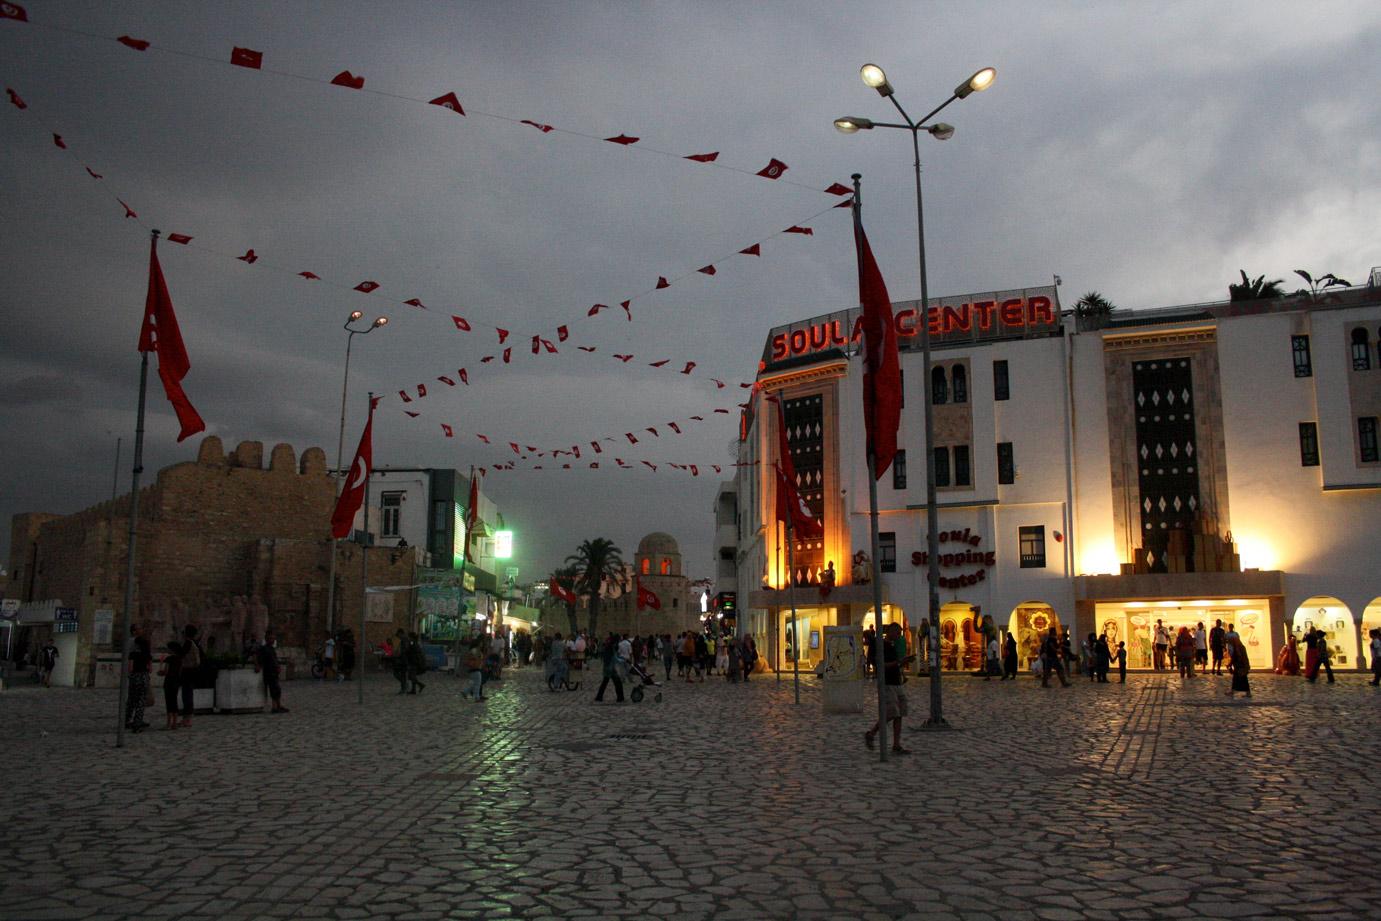 TUNISIA: PHOTO DIARY II. 18